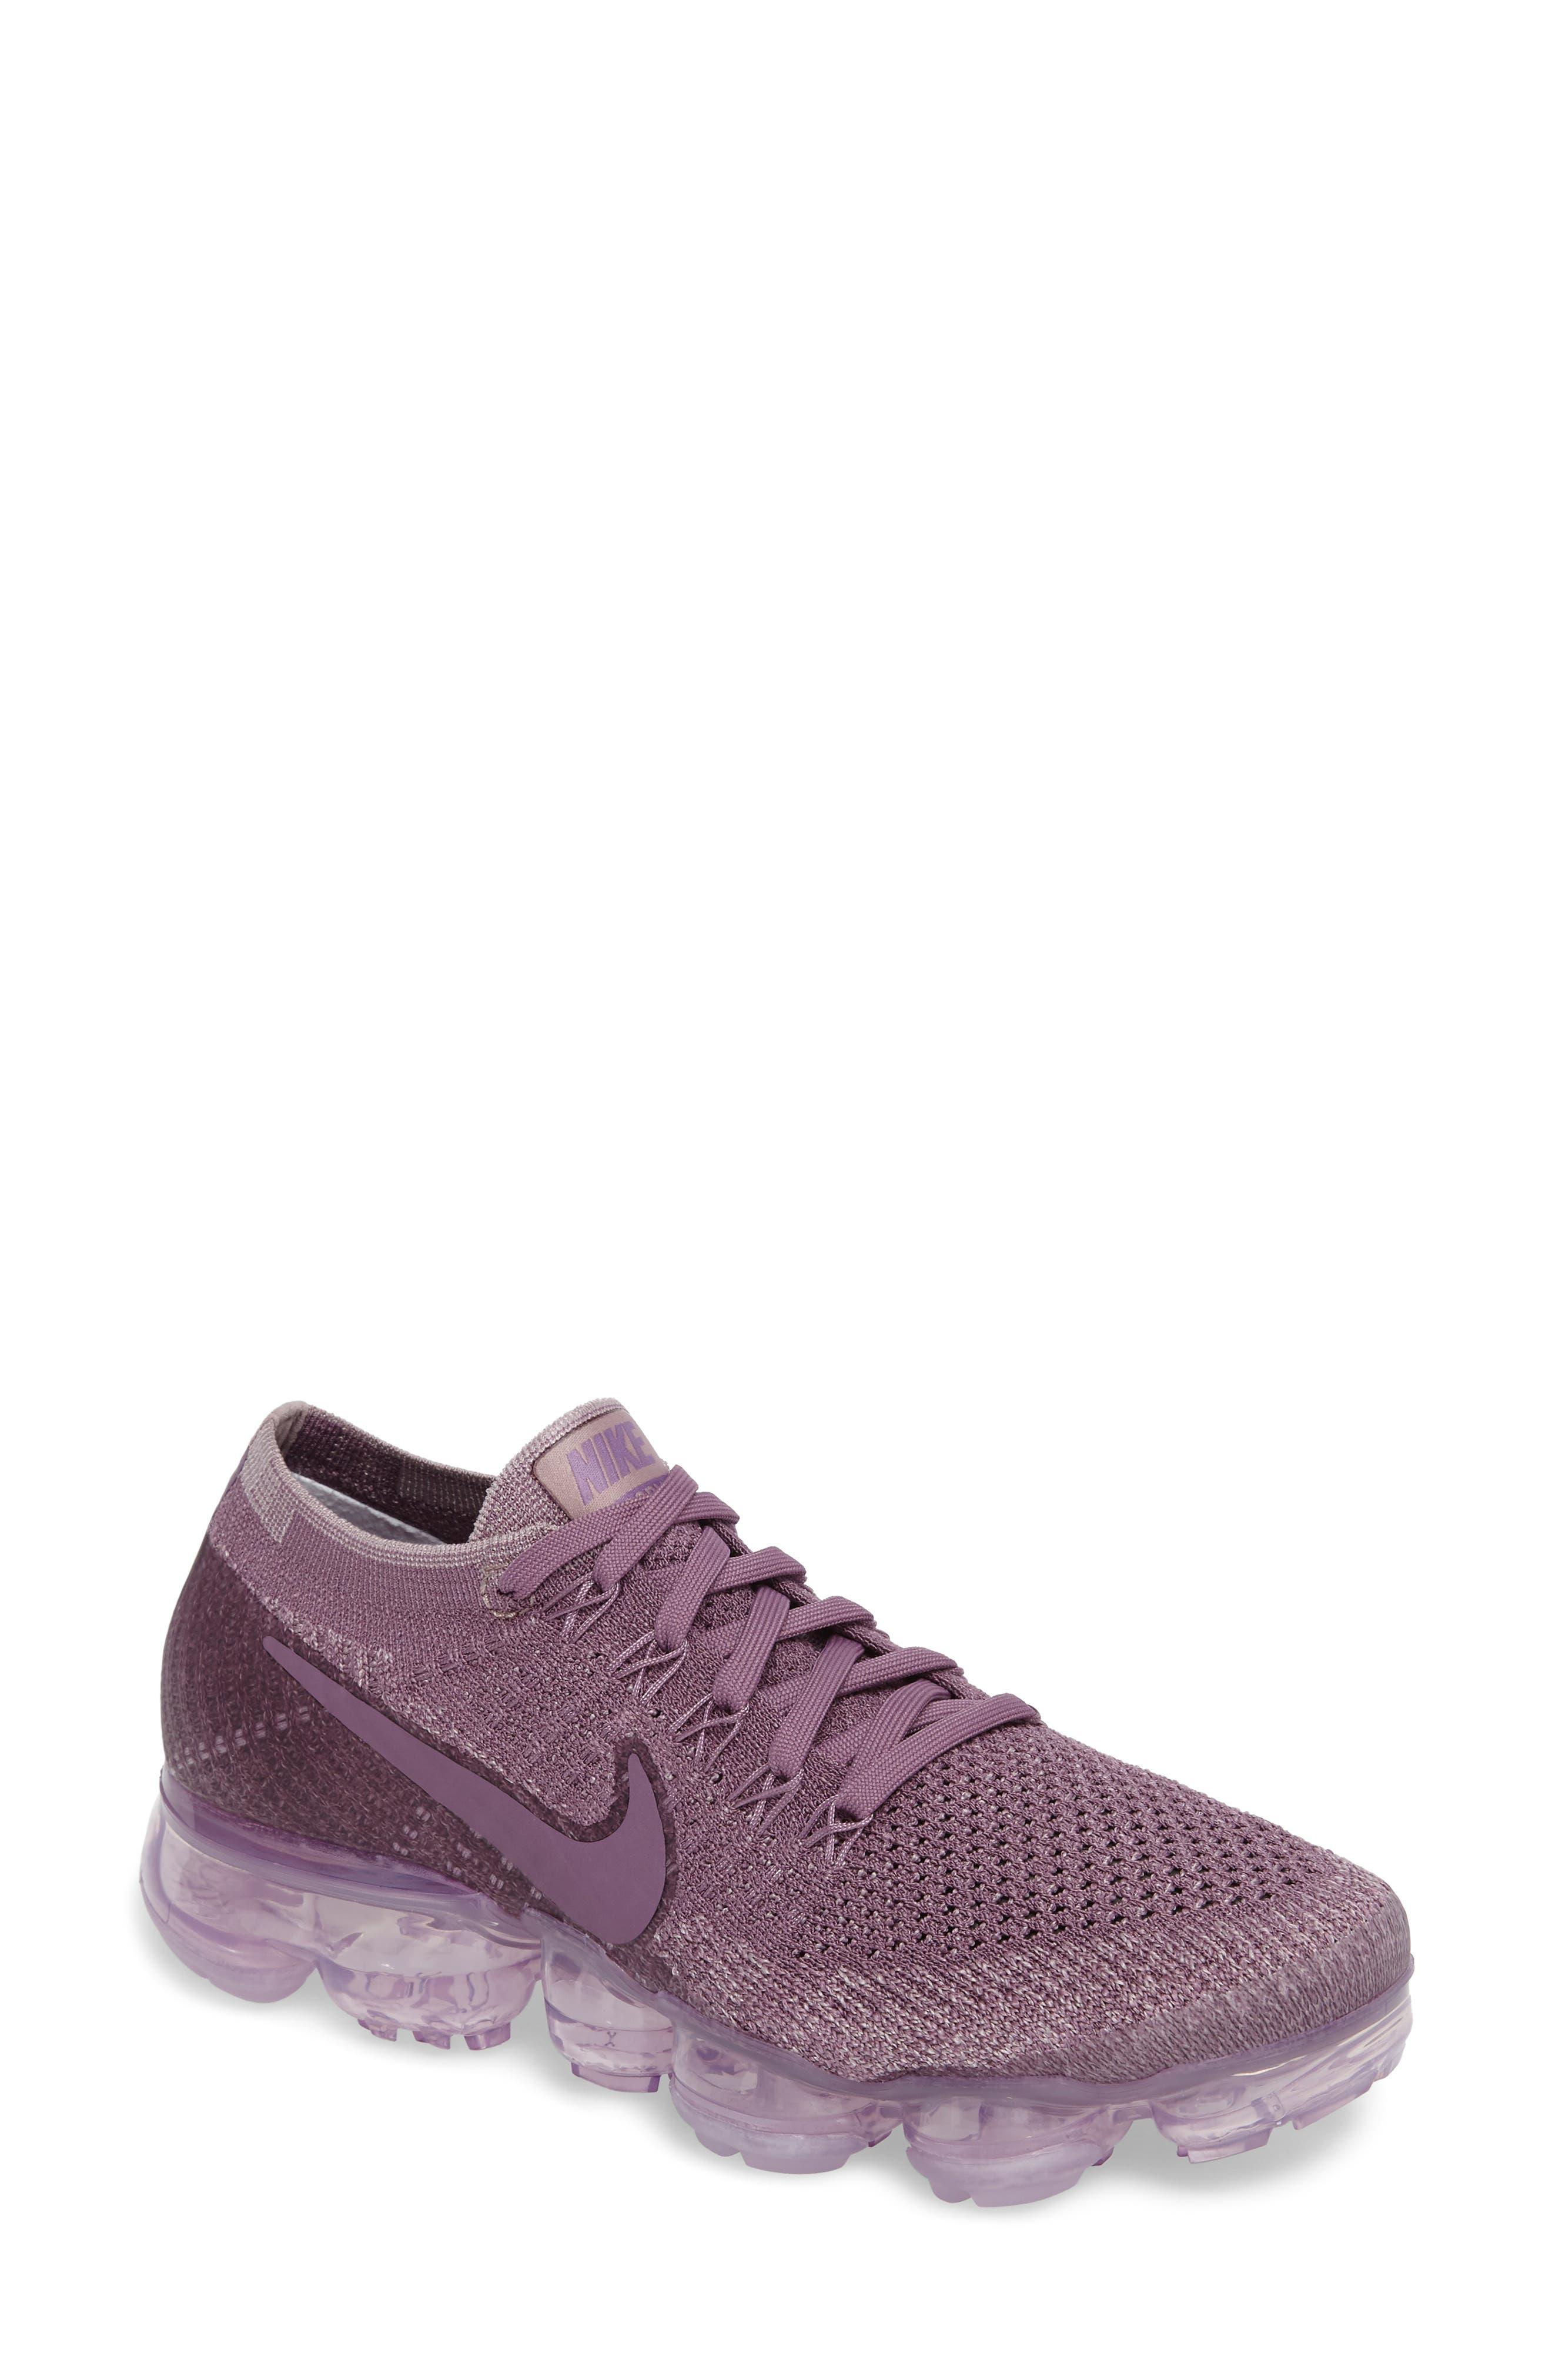 Air VaporMax Flyknit Running Shoe,                             Main thumbnail 1, color,                             Violet Dust/ Plum Fog